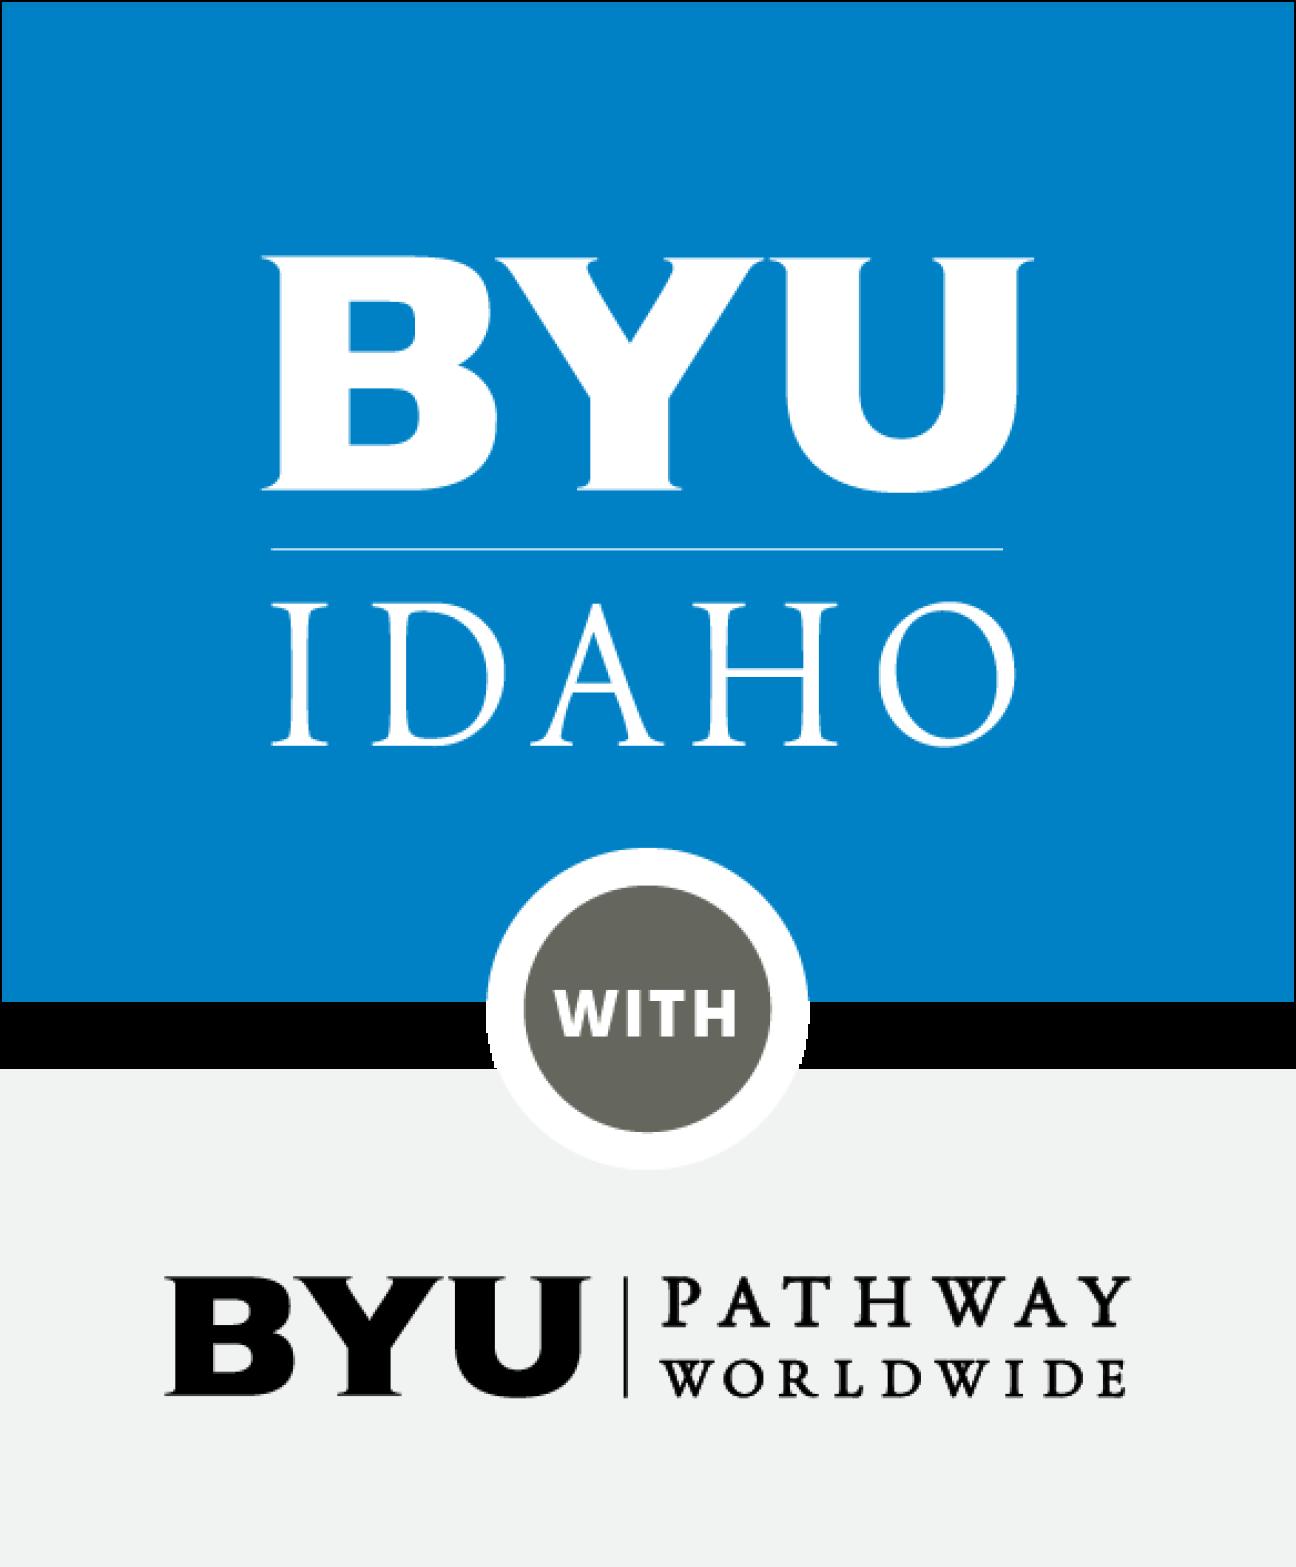 BYU-Idaho + BYU-Pathway